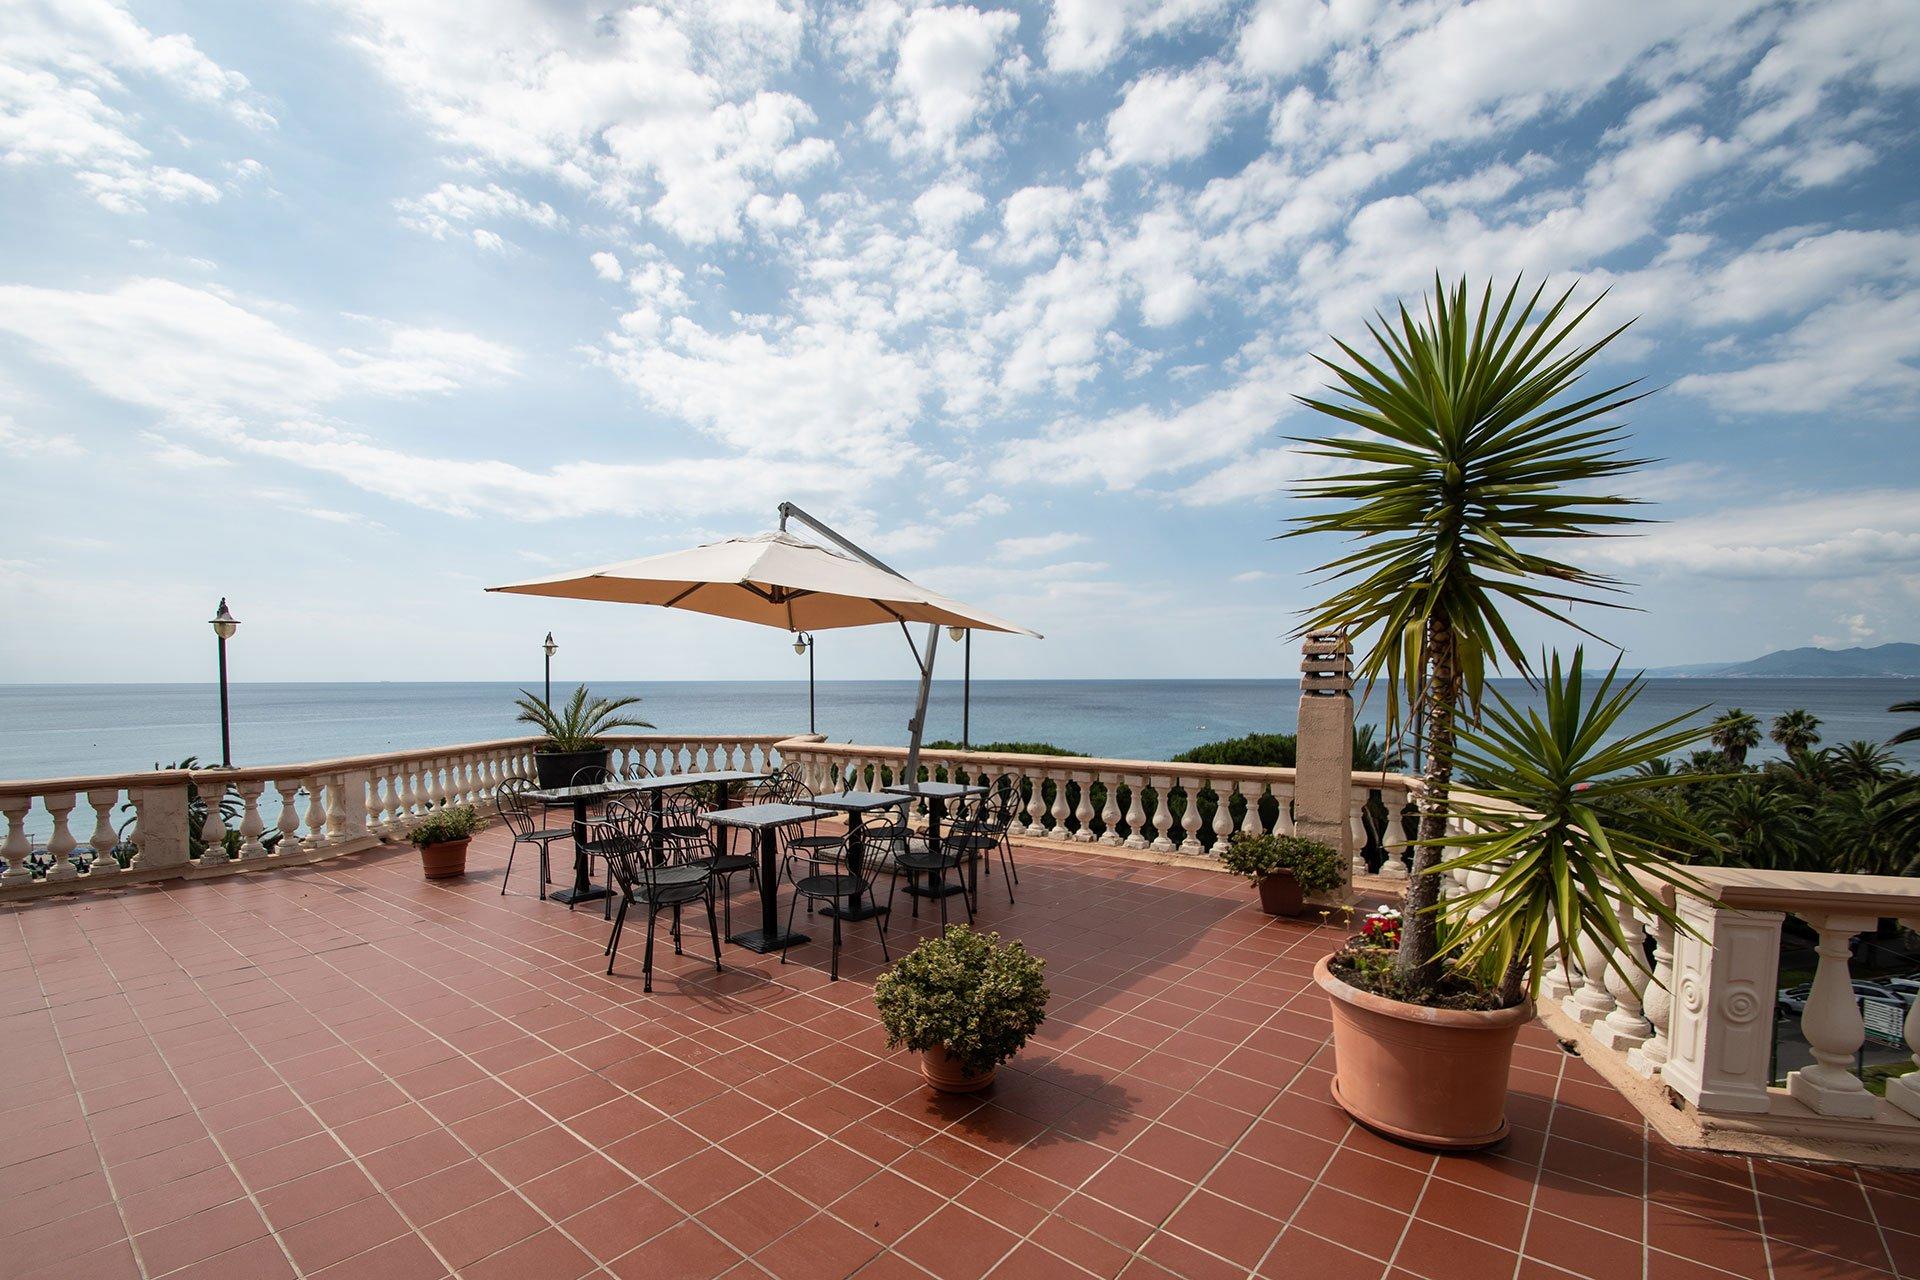 ResidenceConte-terrazza